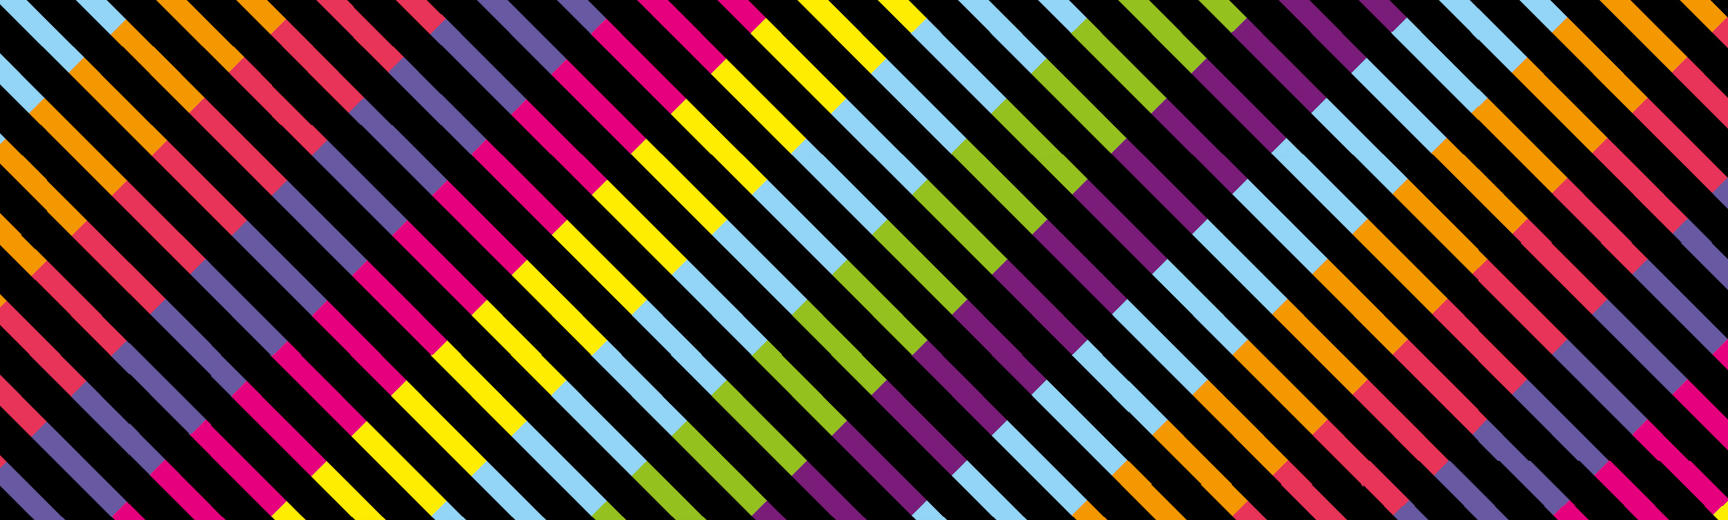 AshPass geometric colour background